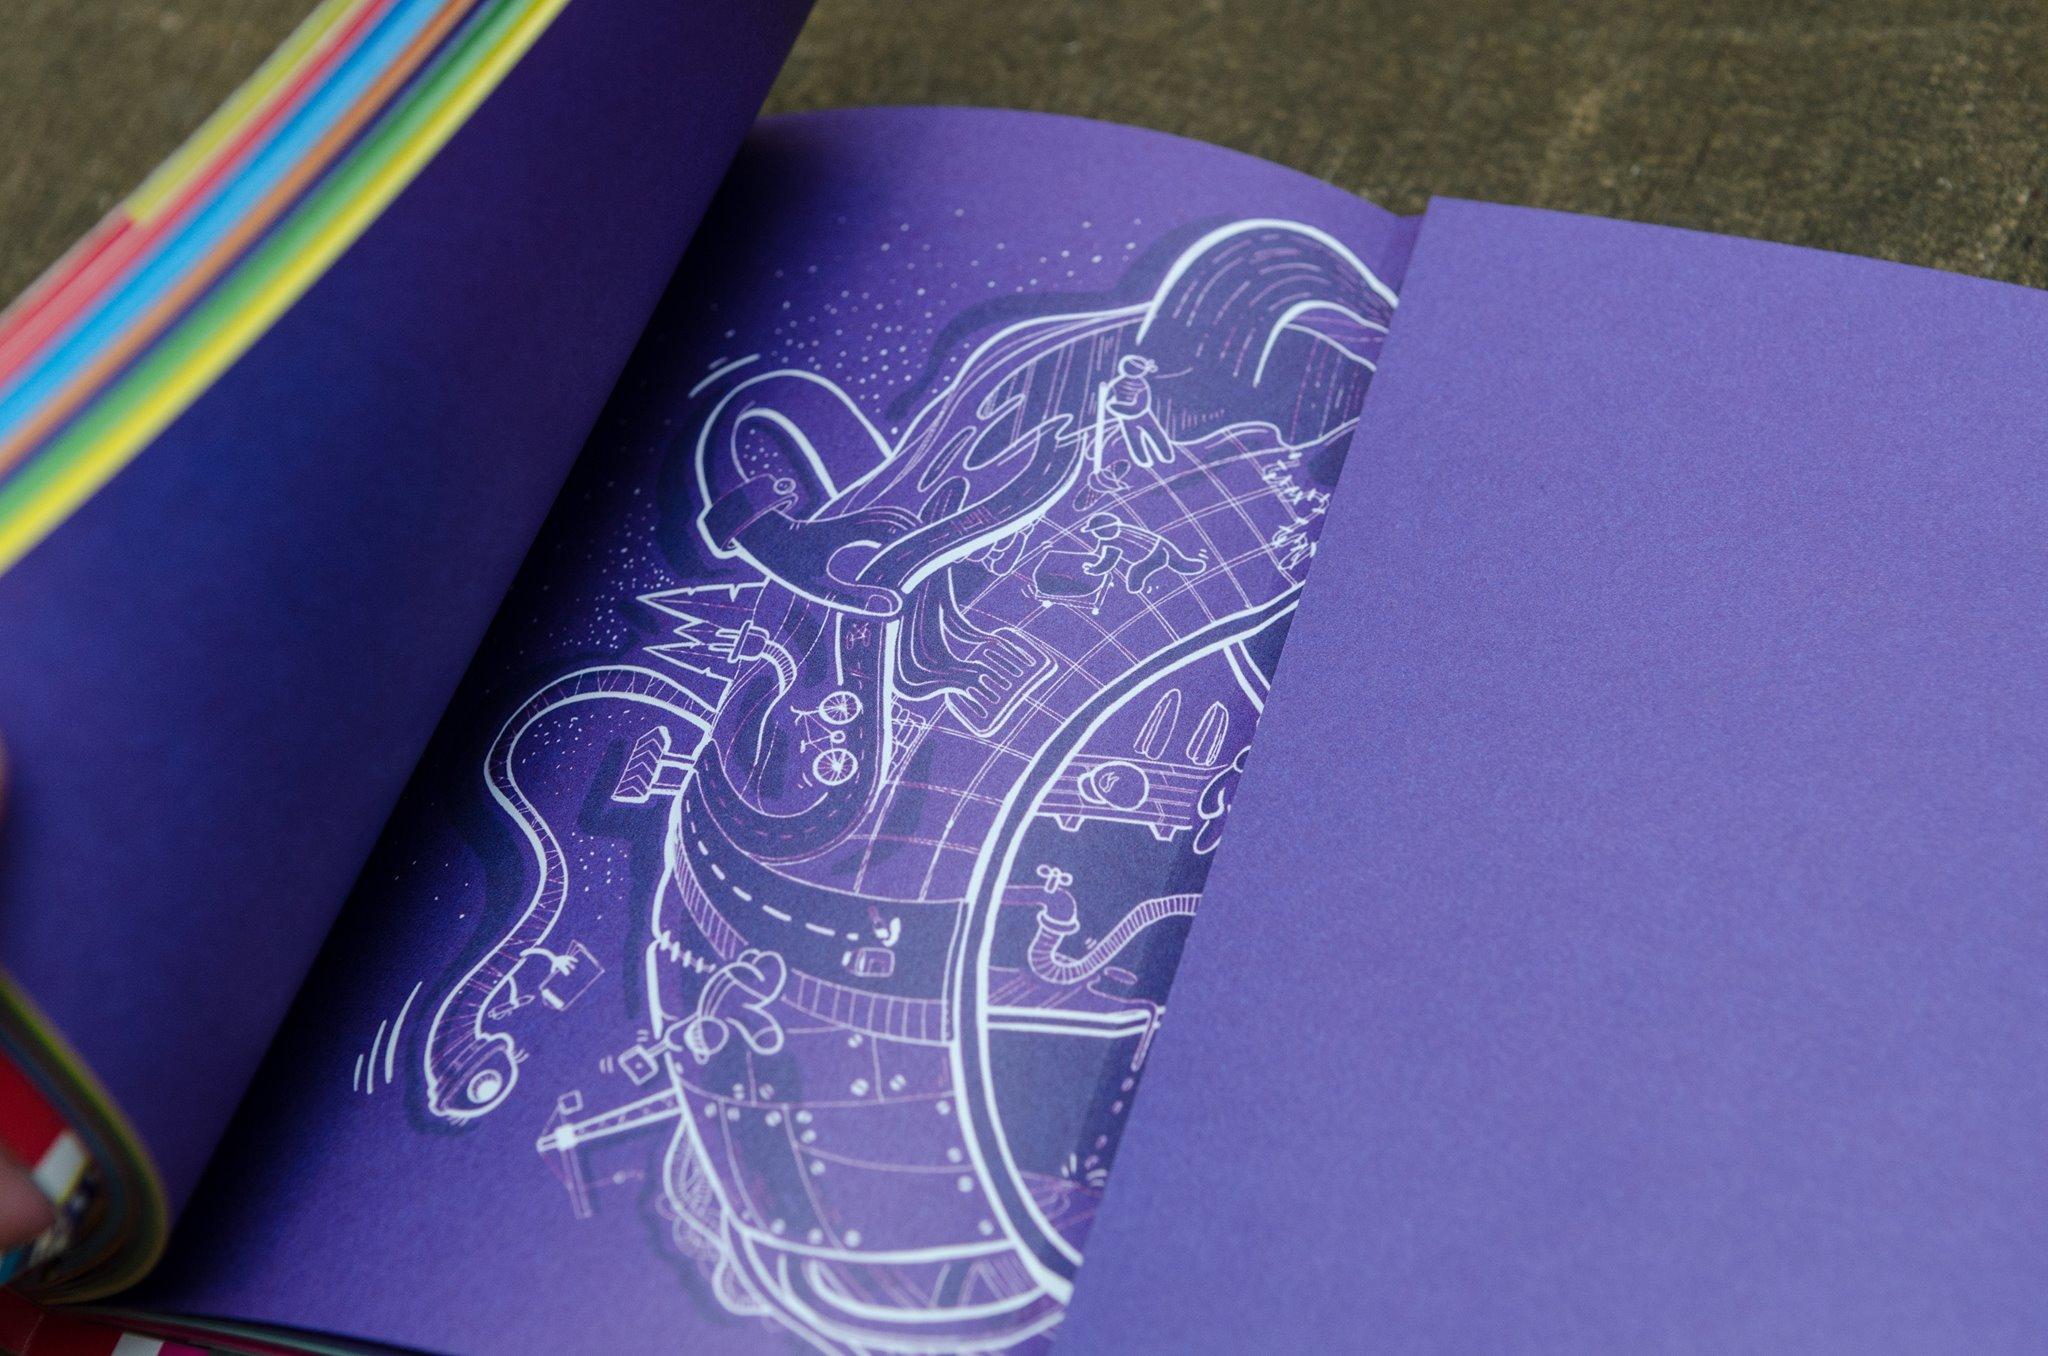 Funk Citizens Constitution for school children, illustration done by raluca mitarca on dark purple backgroun